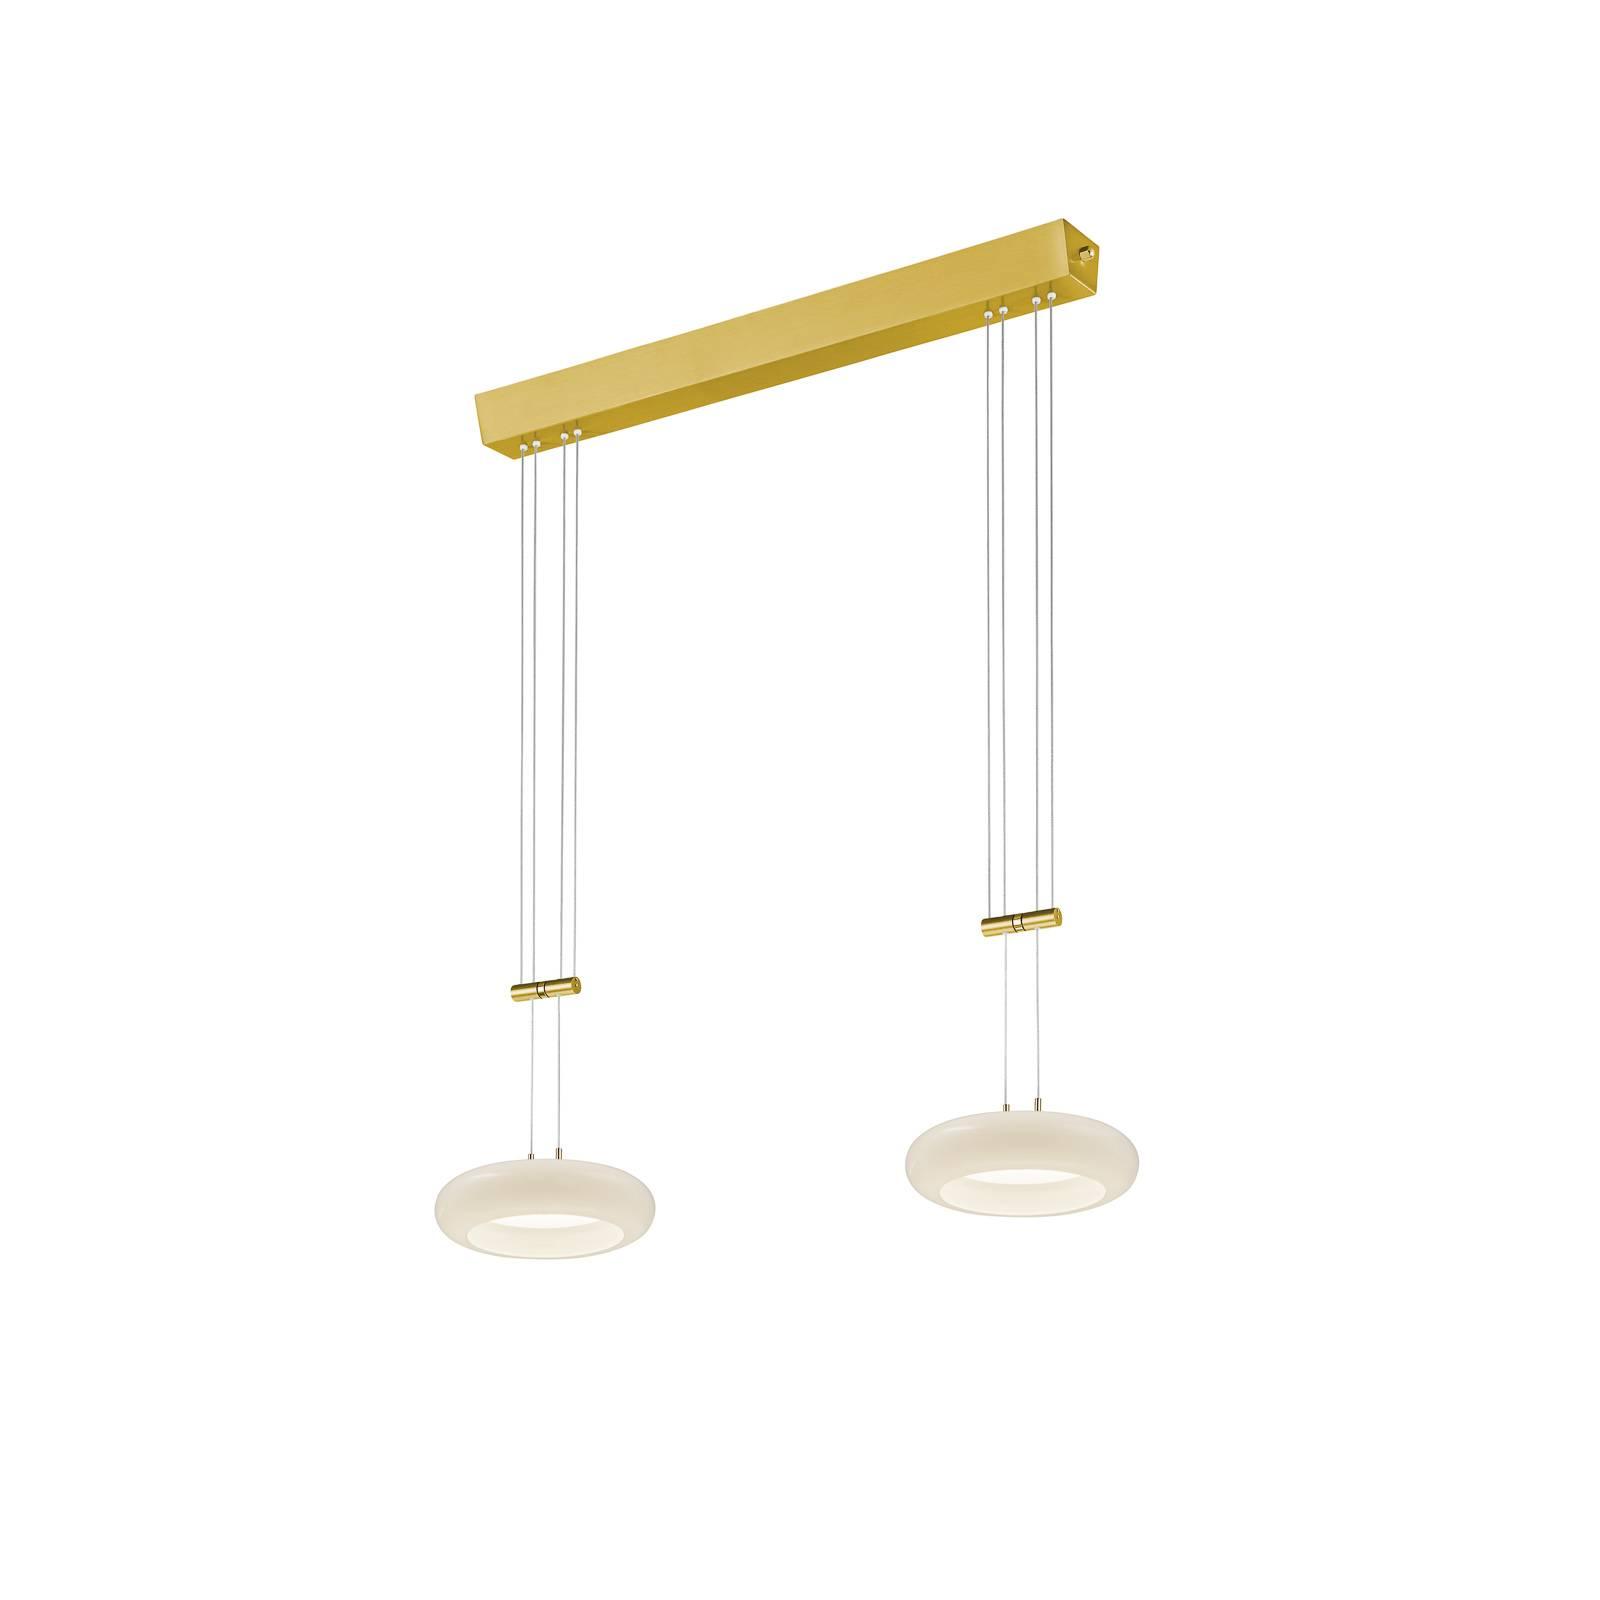 BANKAMP Centa hanglamp 2-lamps messing